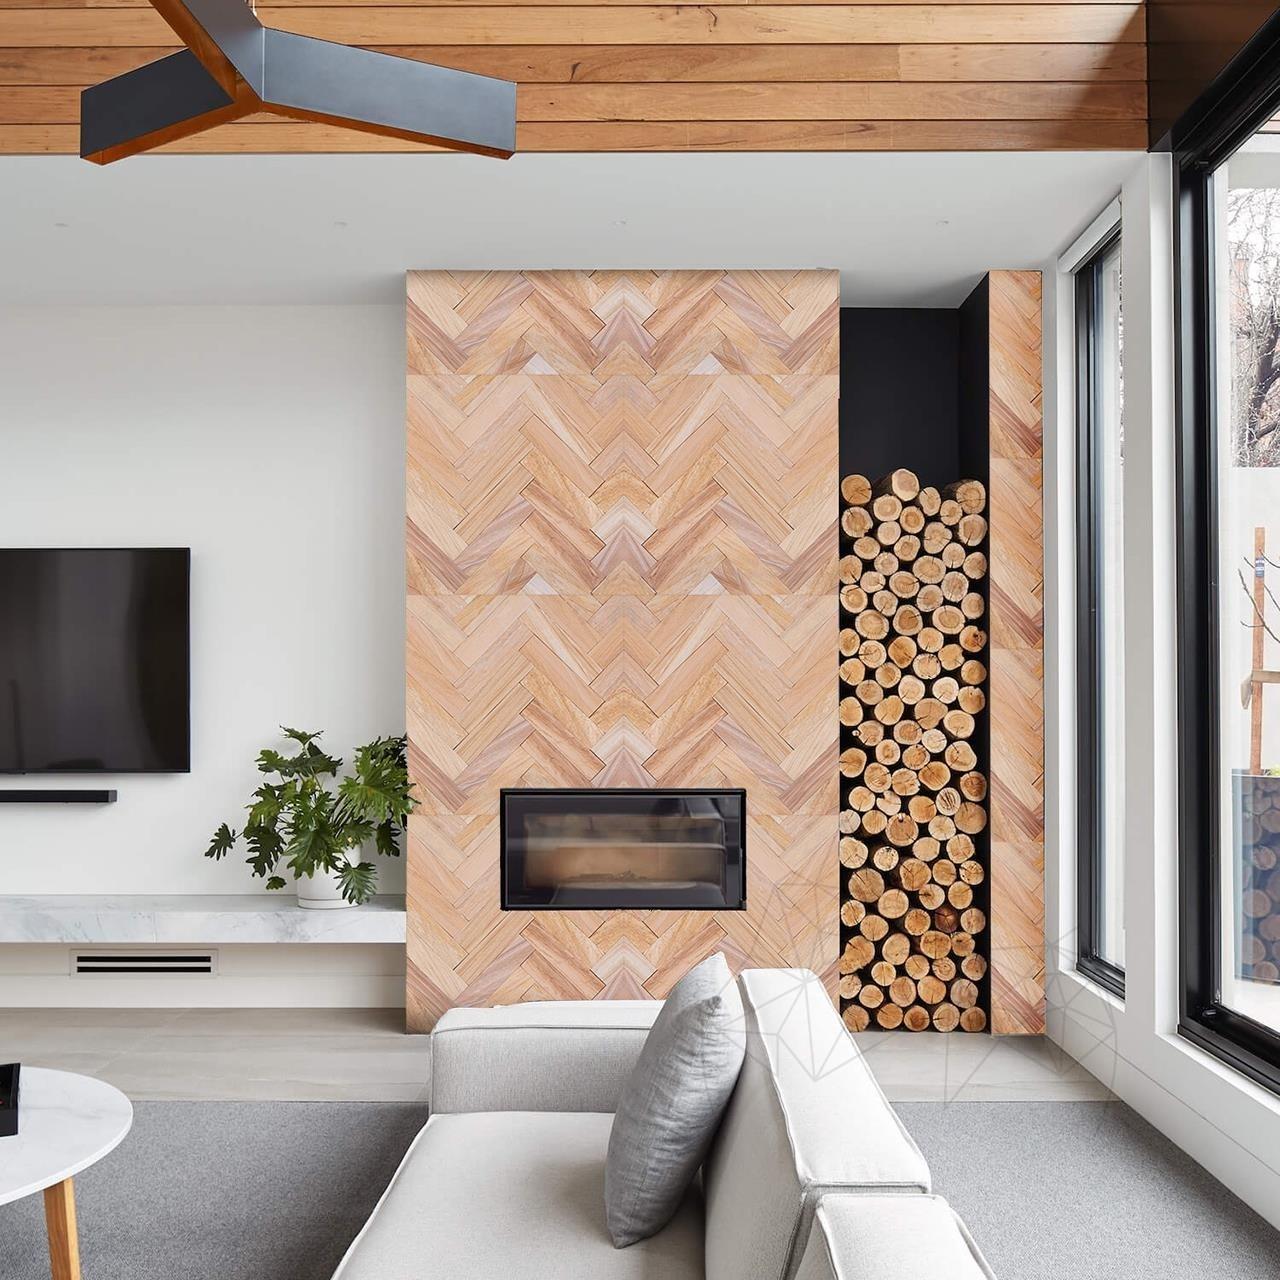 Teakwood Honed Sandstone 7 x 30 x 1 cm